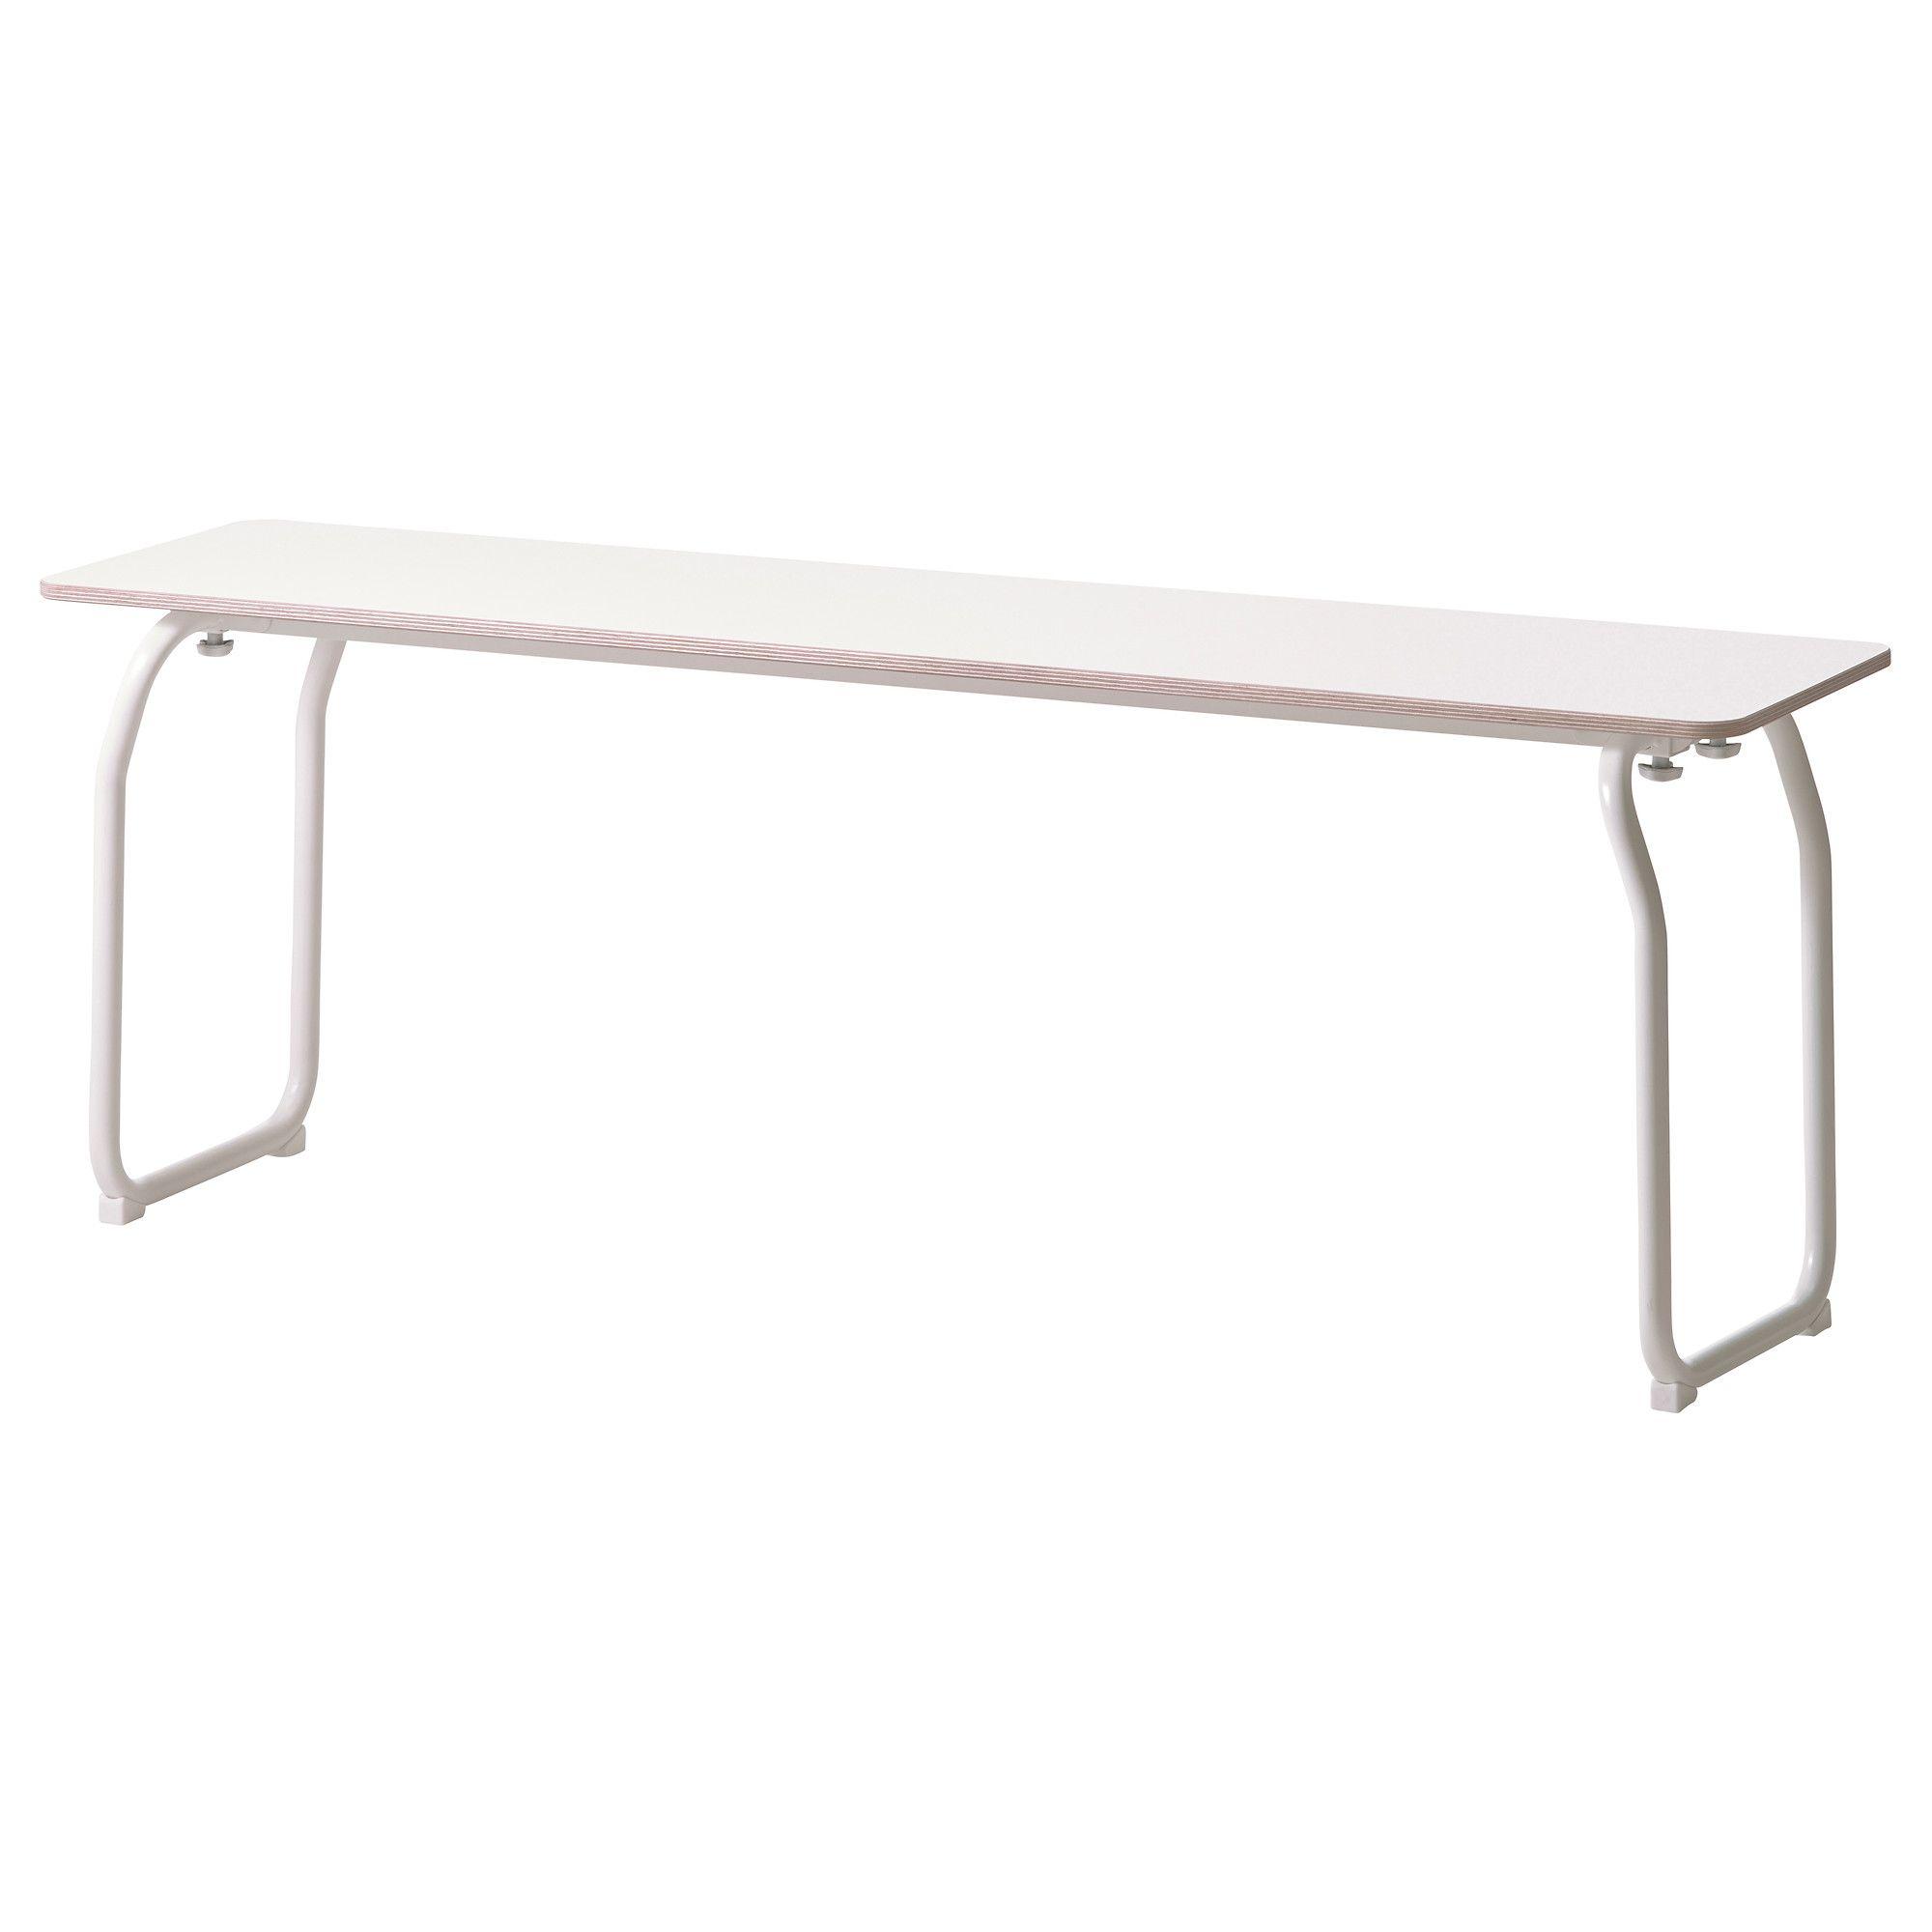 IKEA PS 2014 Bench. Length: 51 1/8